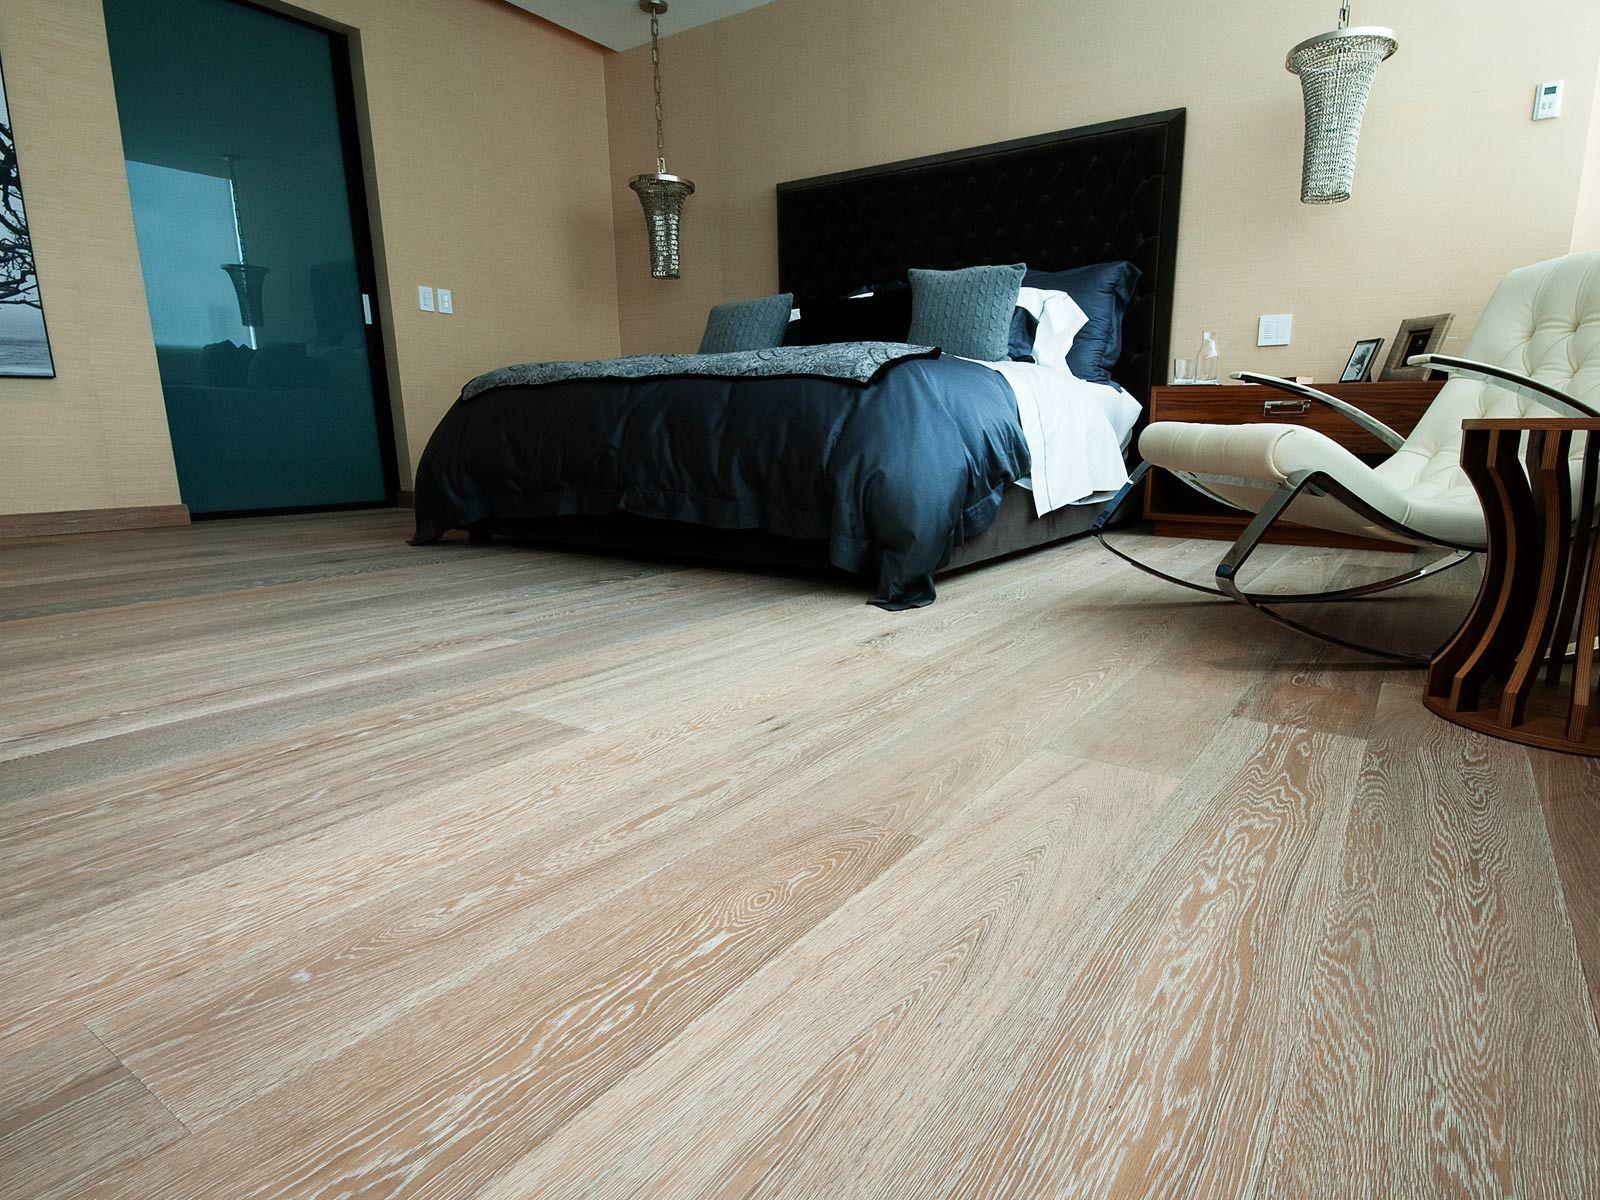 Gallery, Solid Wood Flooring, Hard Wood Floors | new house ...